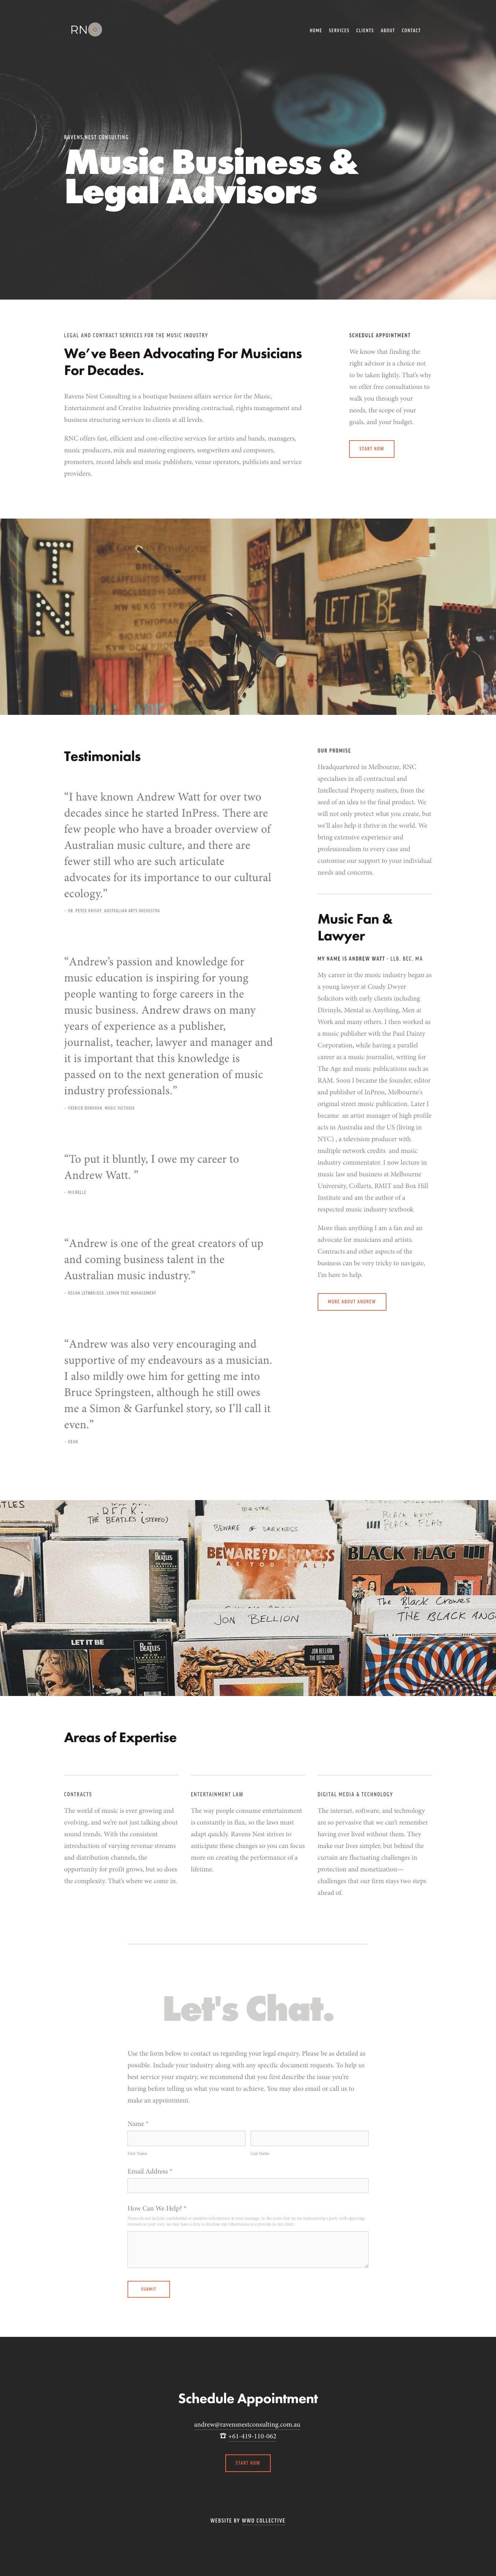 CLIENT SPOTLIGHT: Ravens Nest Consulting — Wild Willow Design